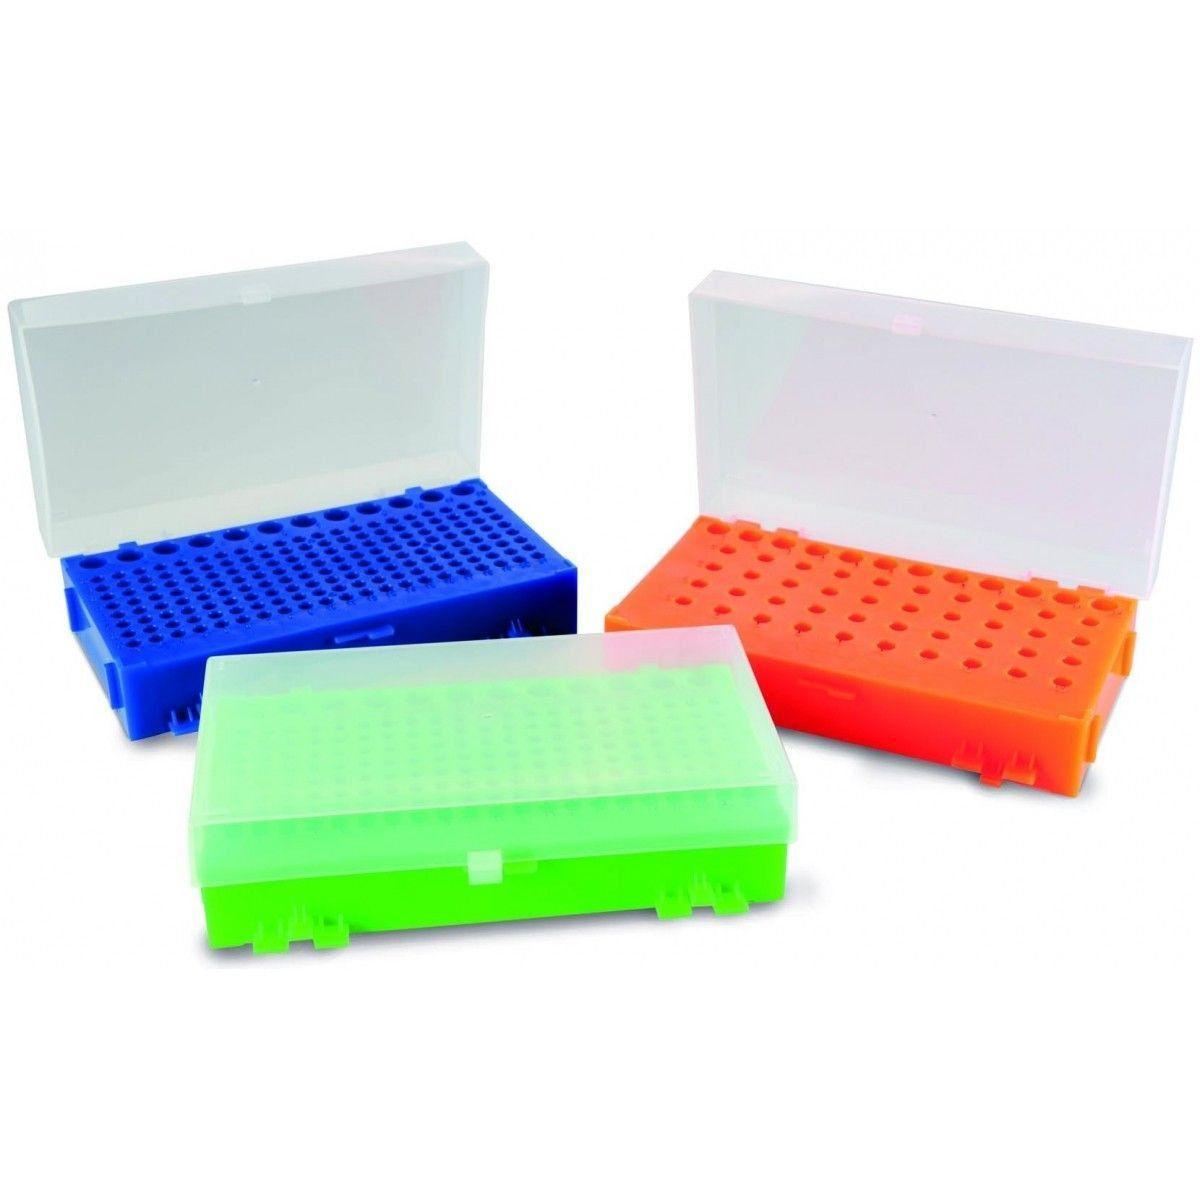 RACK ESTANTE DUPLA FACE PARA MICROTUBOS DE PCR DE 0,2 ML A 1,5 ML K30-003 KASVI